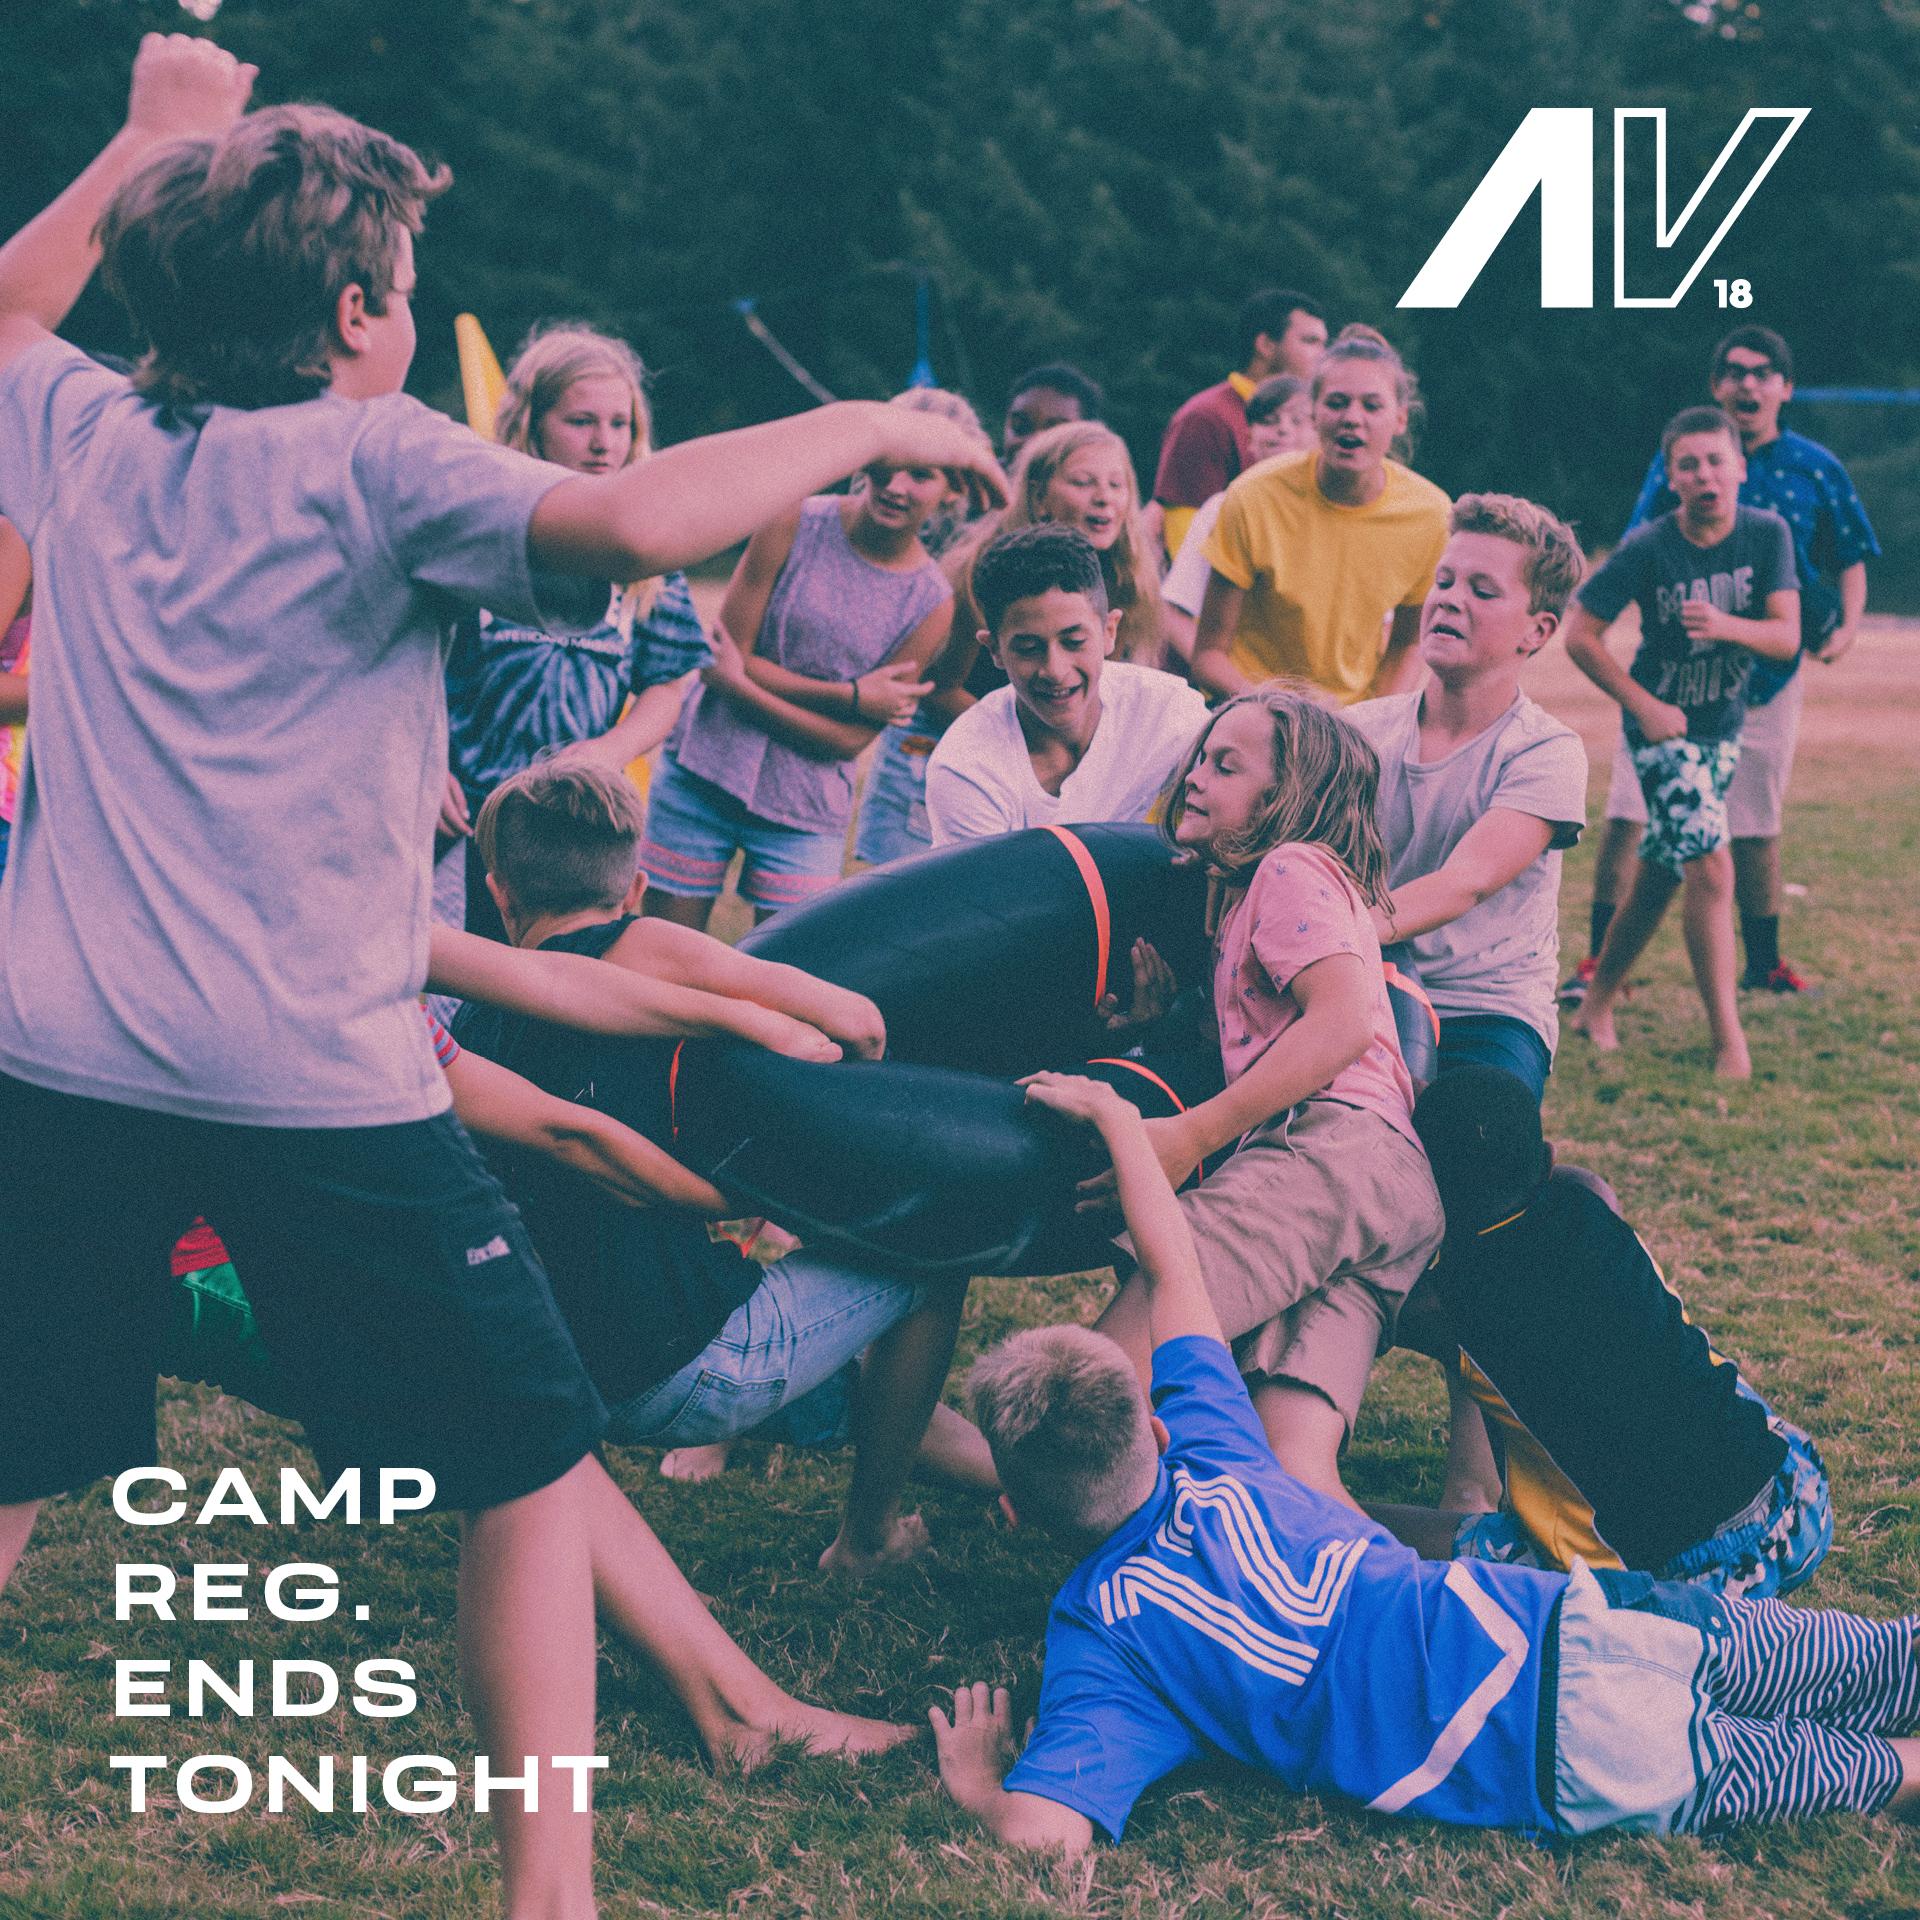 Rev Camp 2018 Camp Reg Ends Tonight.jpg